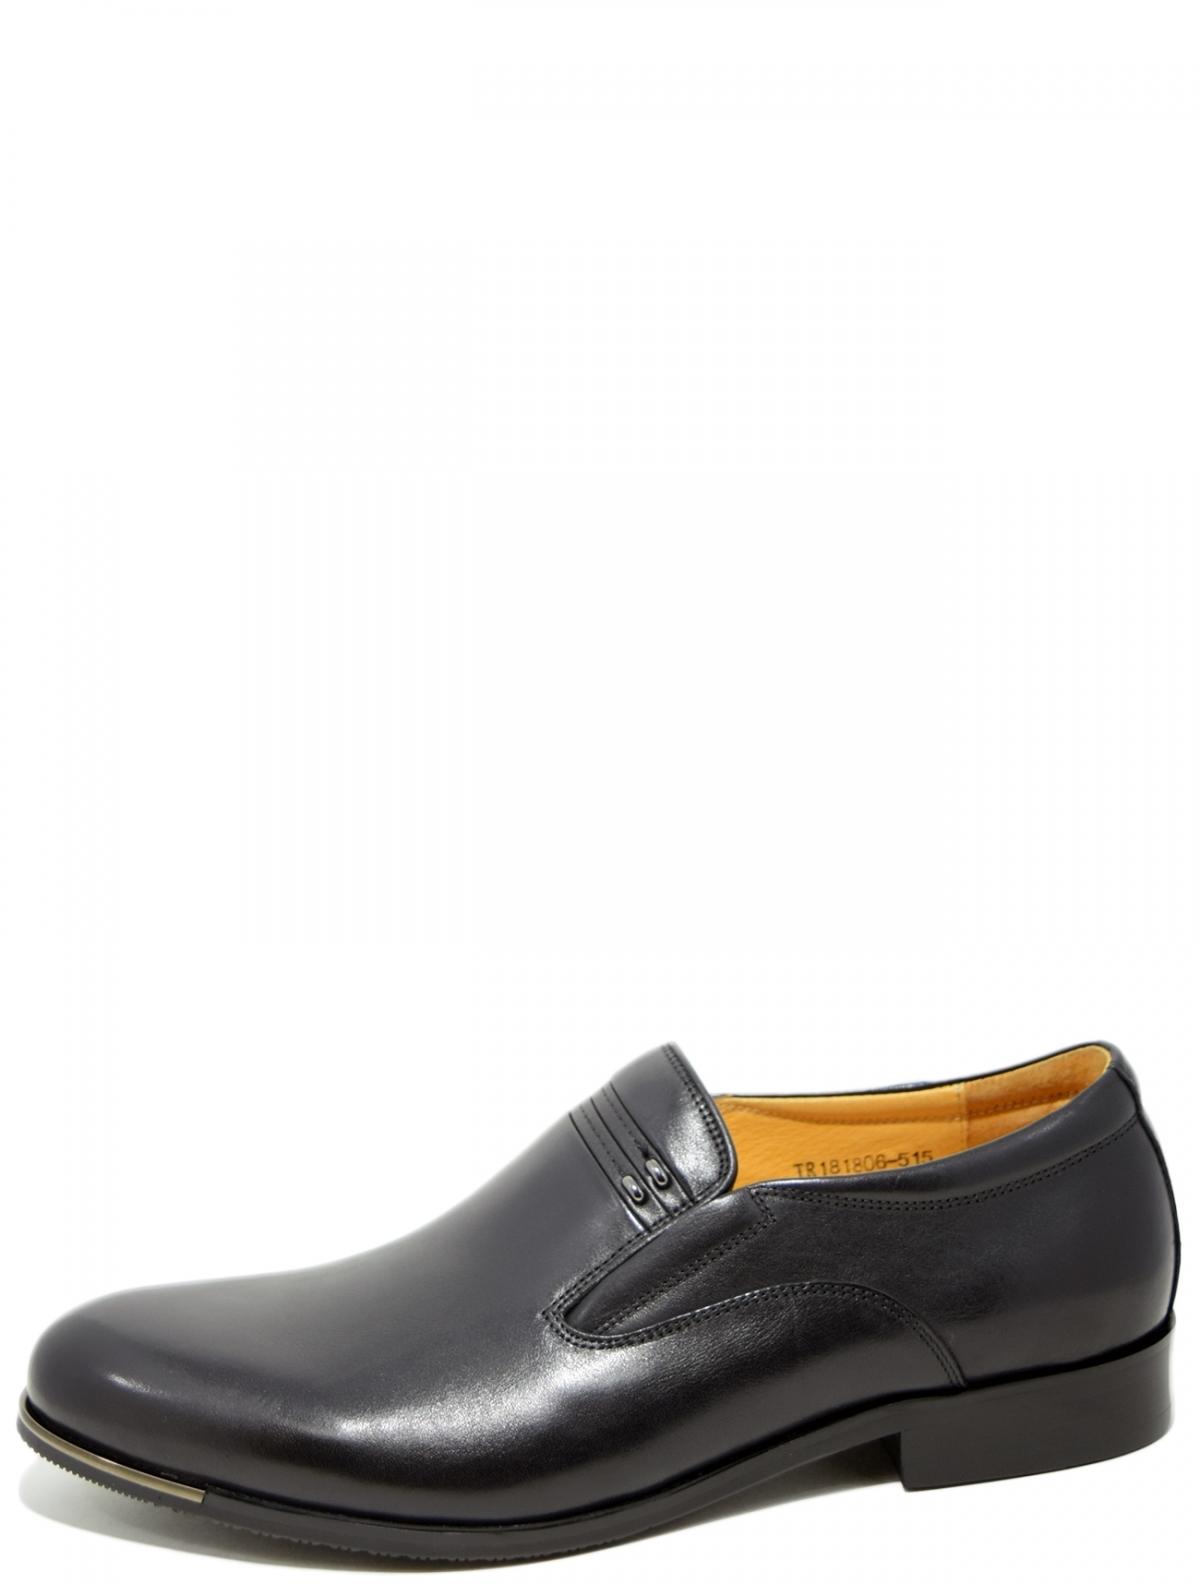 Roscote TR181806-515-5149 мужские туфли